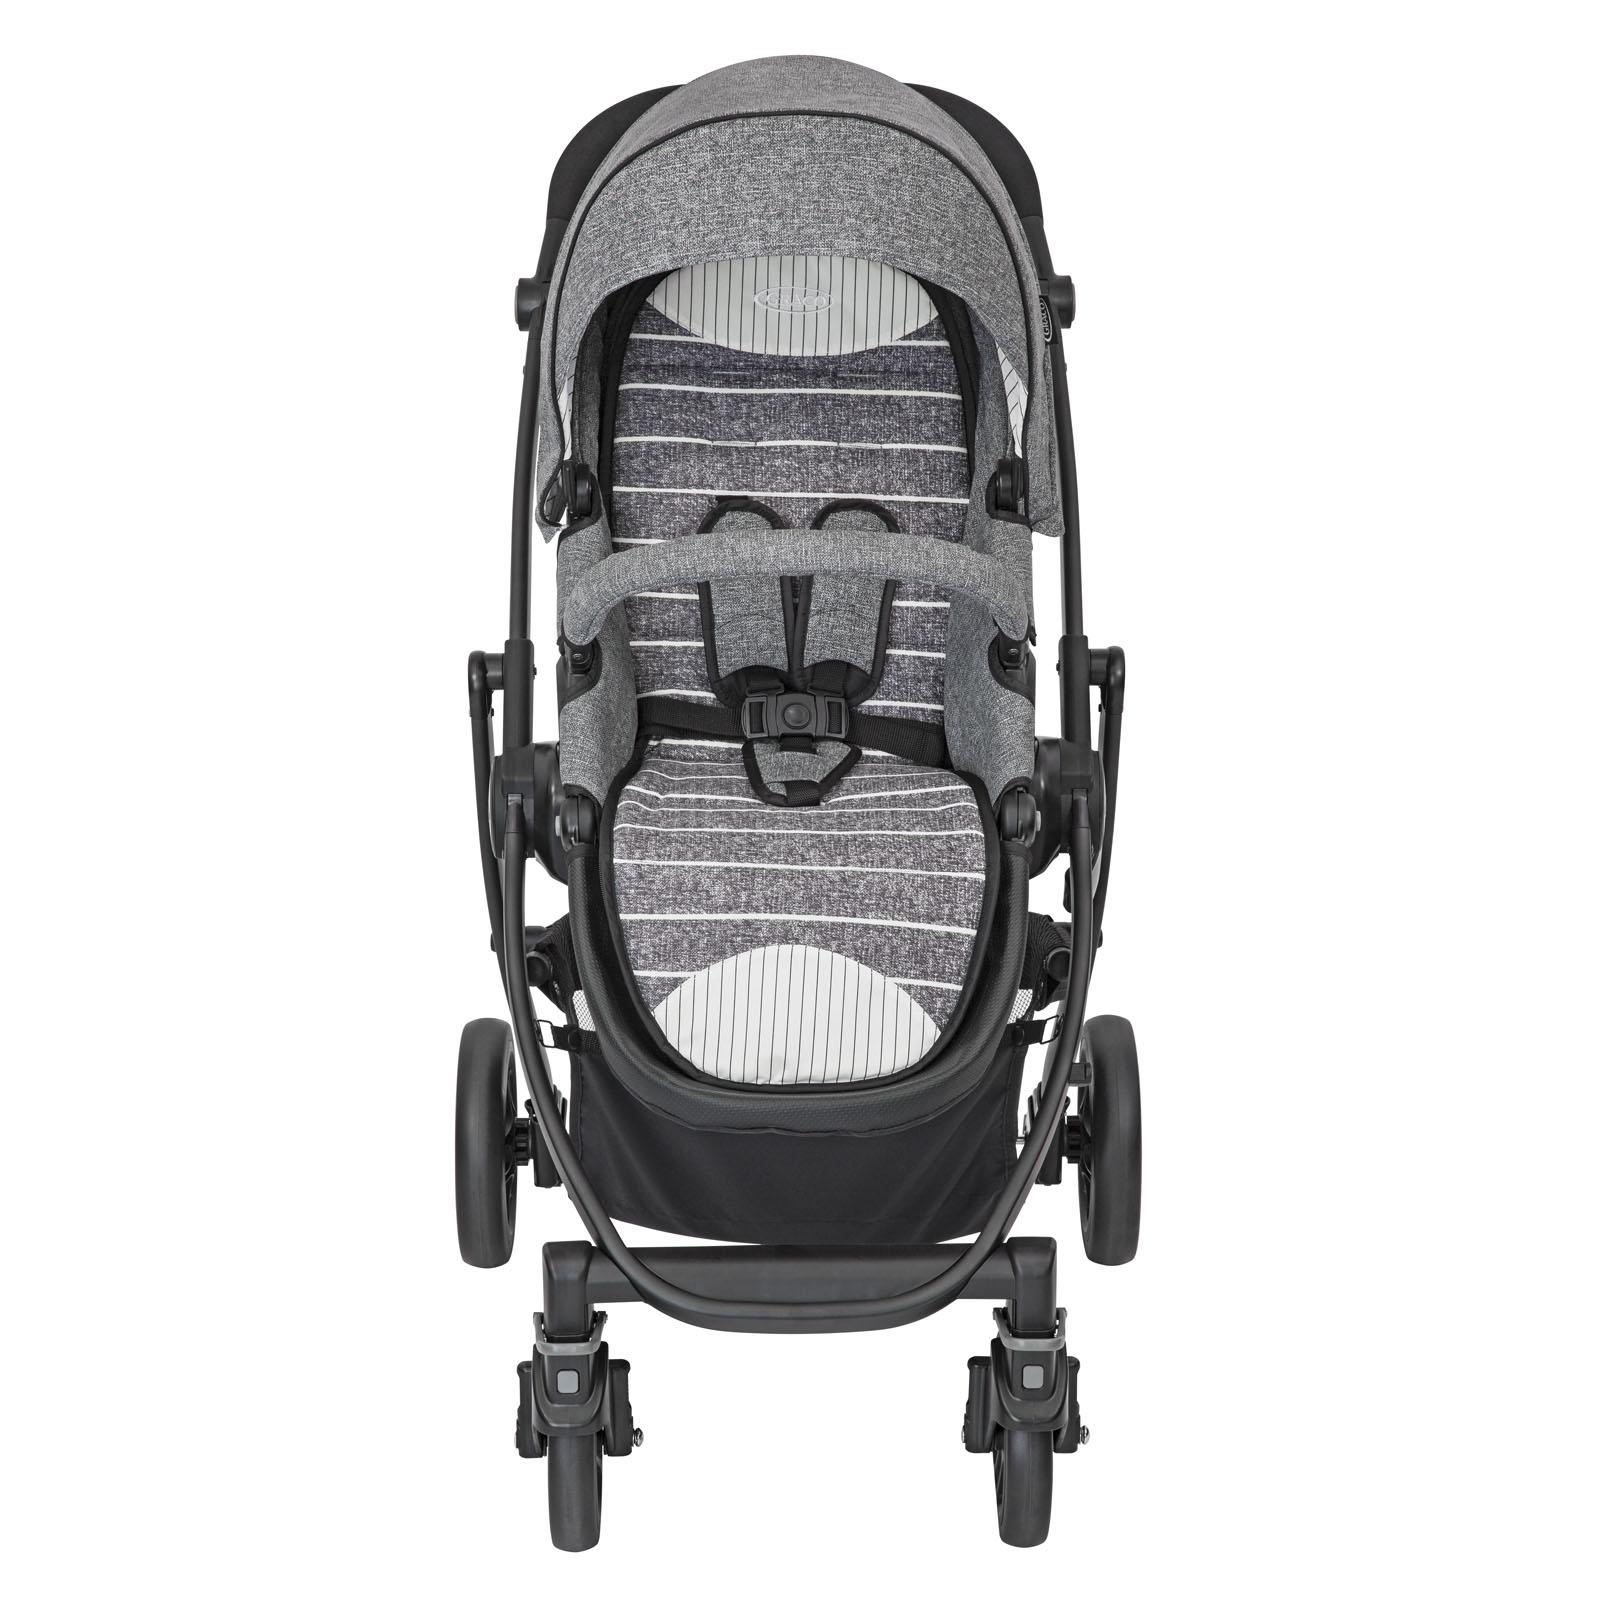 Graco Evo (SnugEssentials Car Seat) Travel System - Suits ...